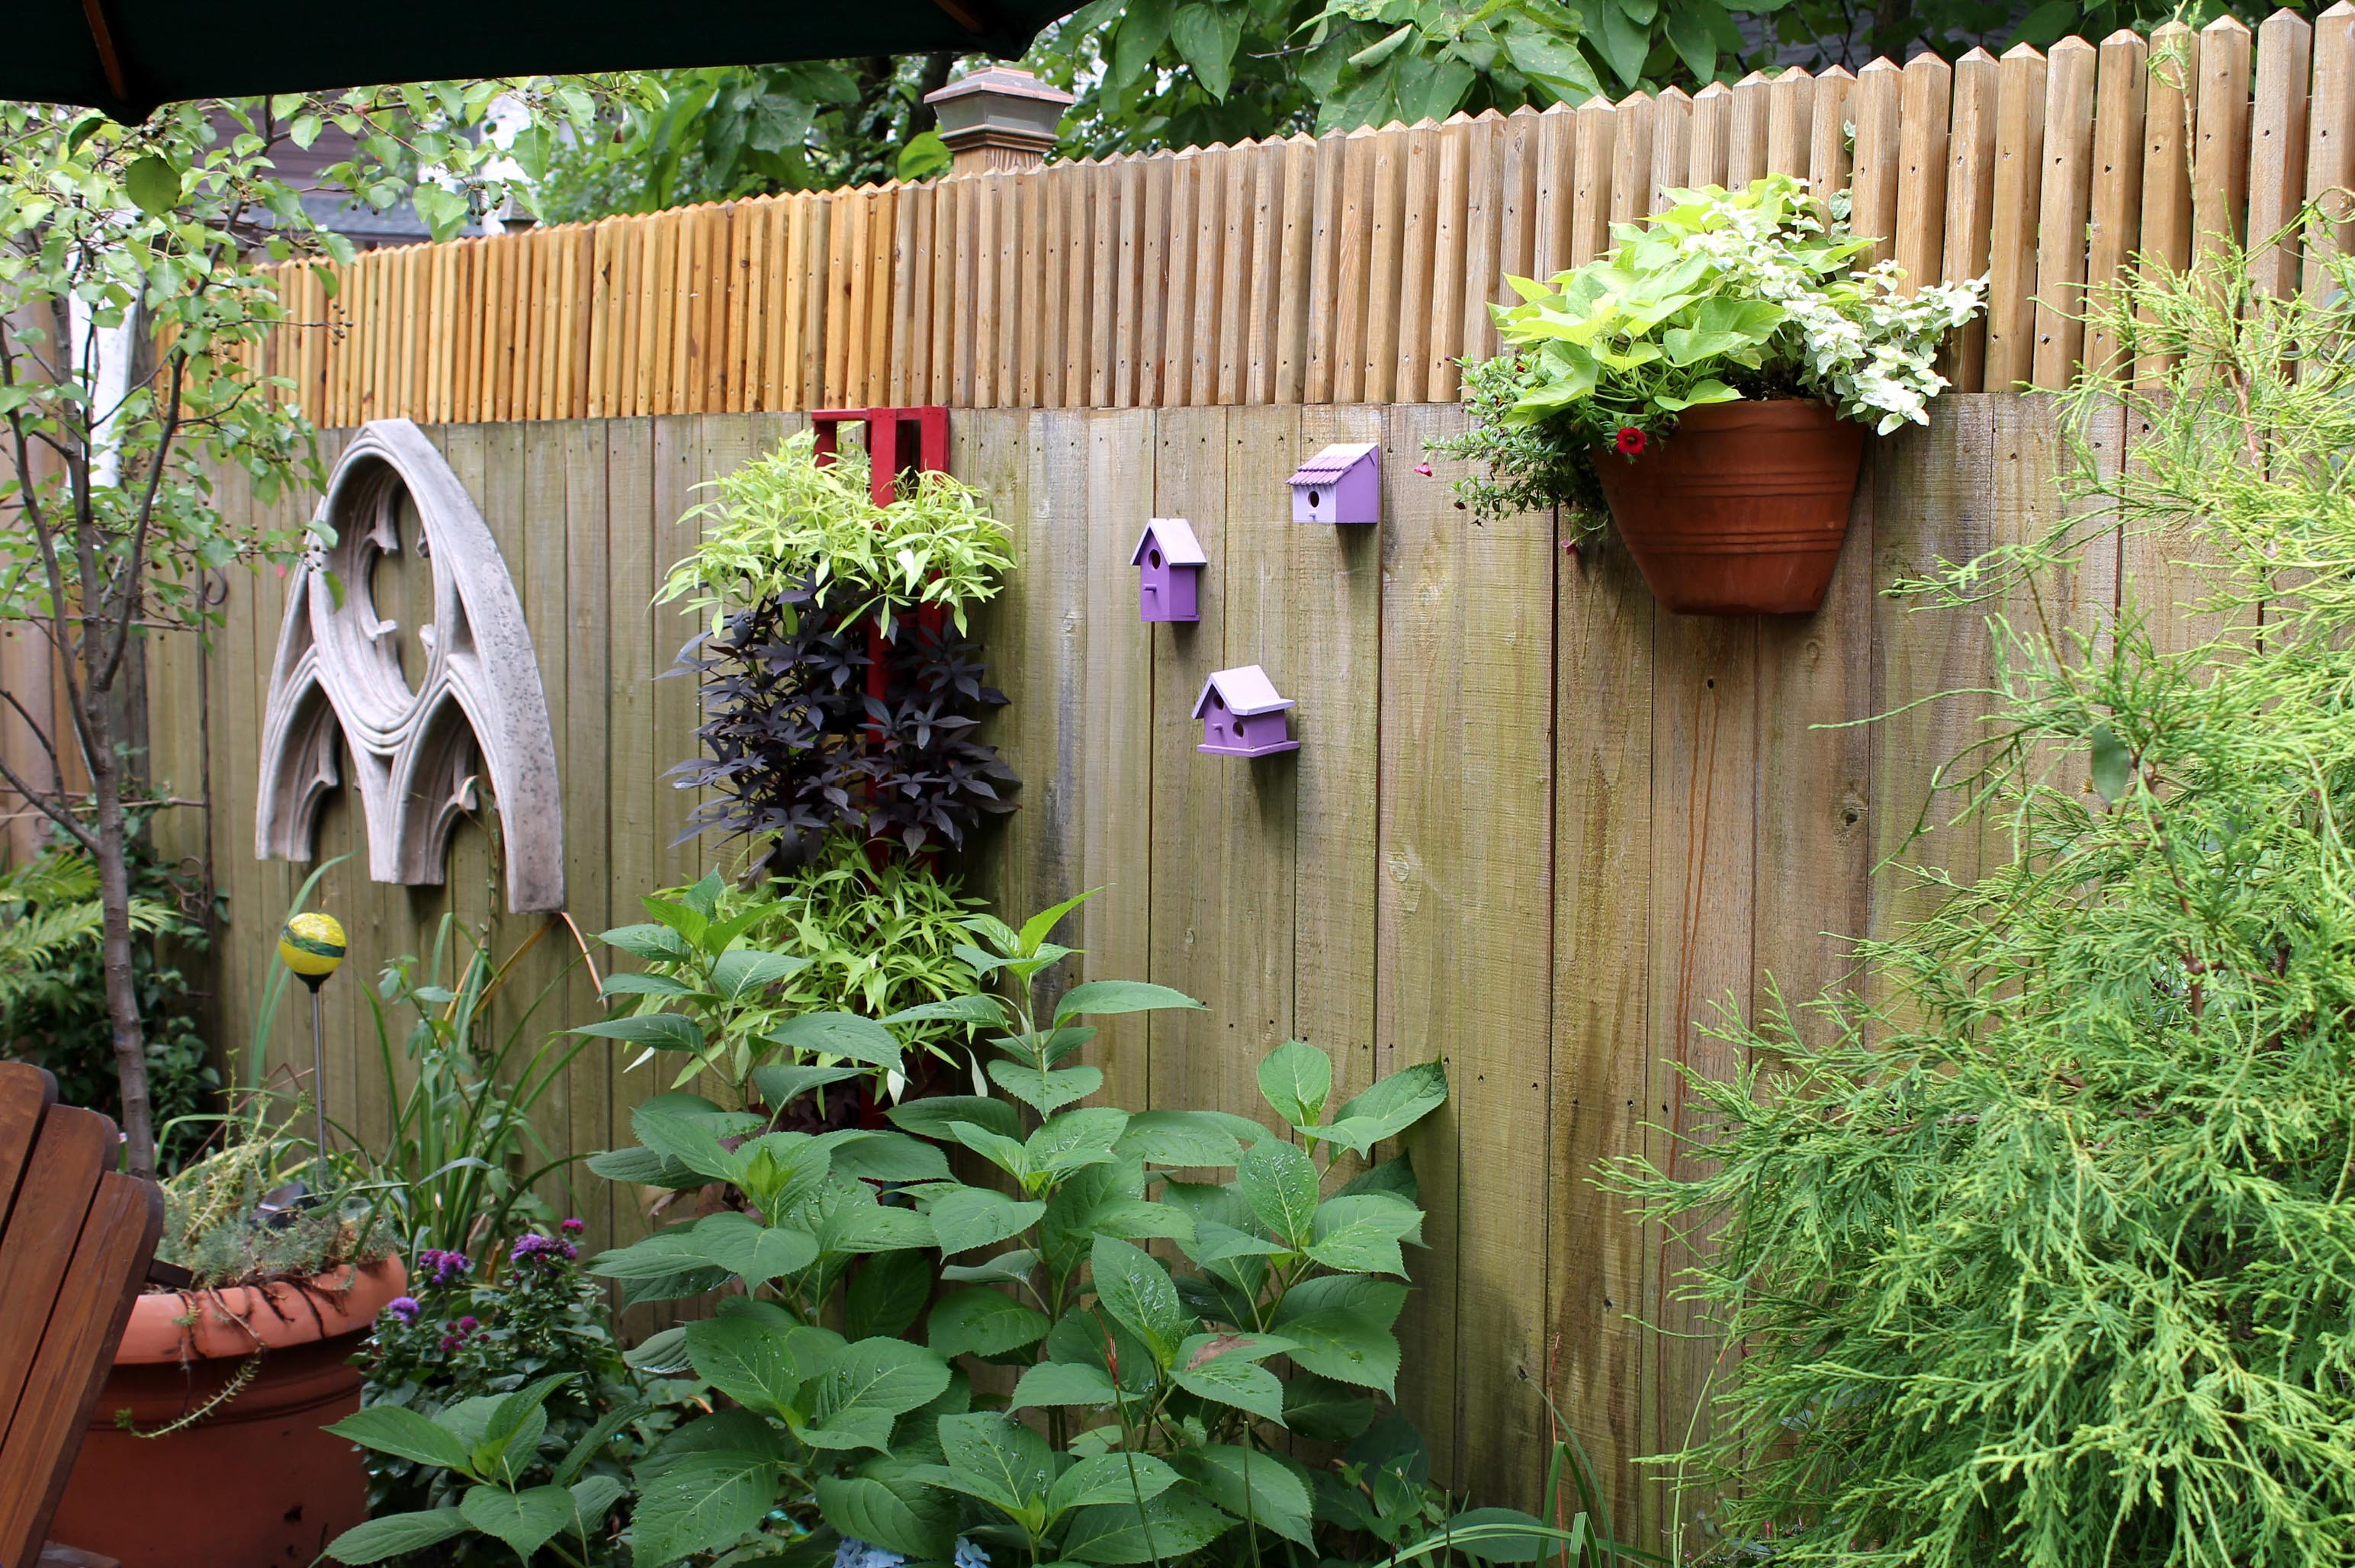 Ealing Backyard Fence Decor For Your Decoration Ideas Decorative Regarding Sizing 3088 X 2056